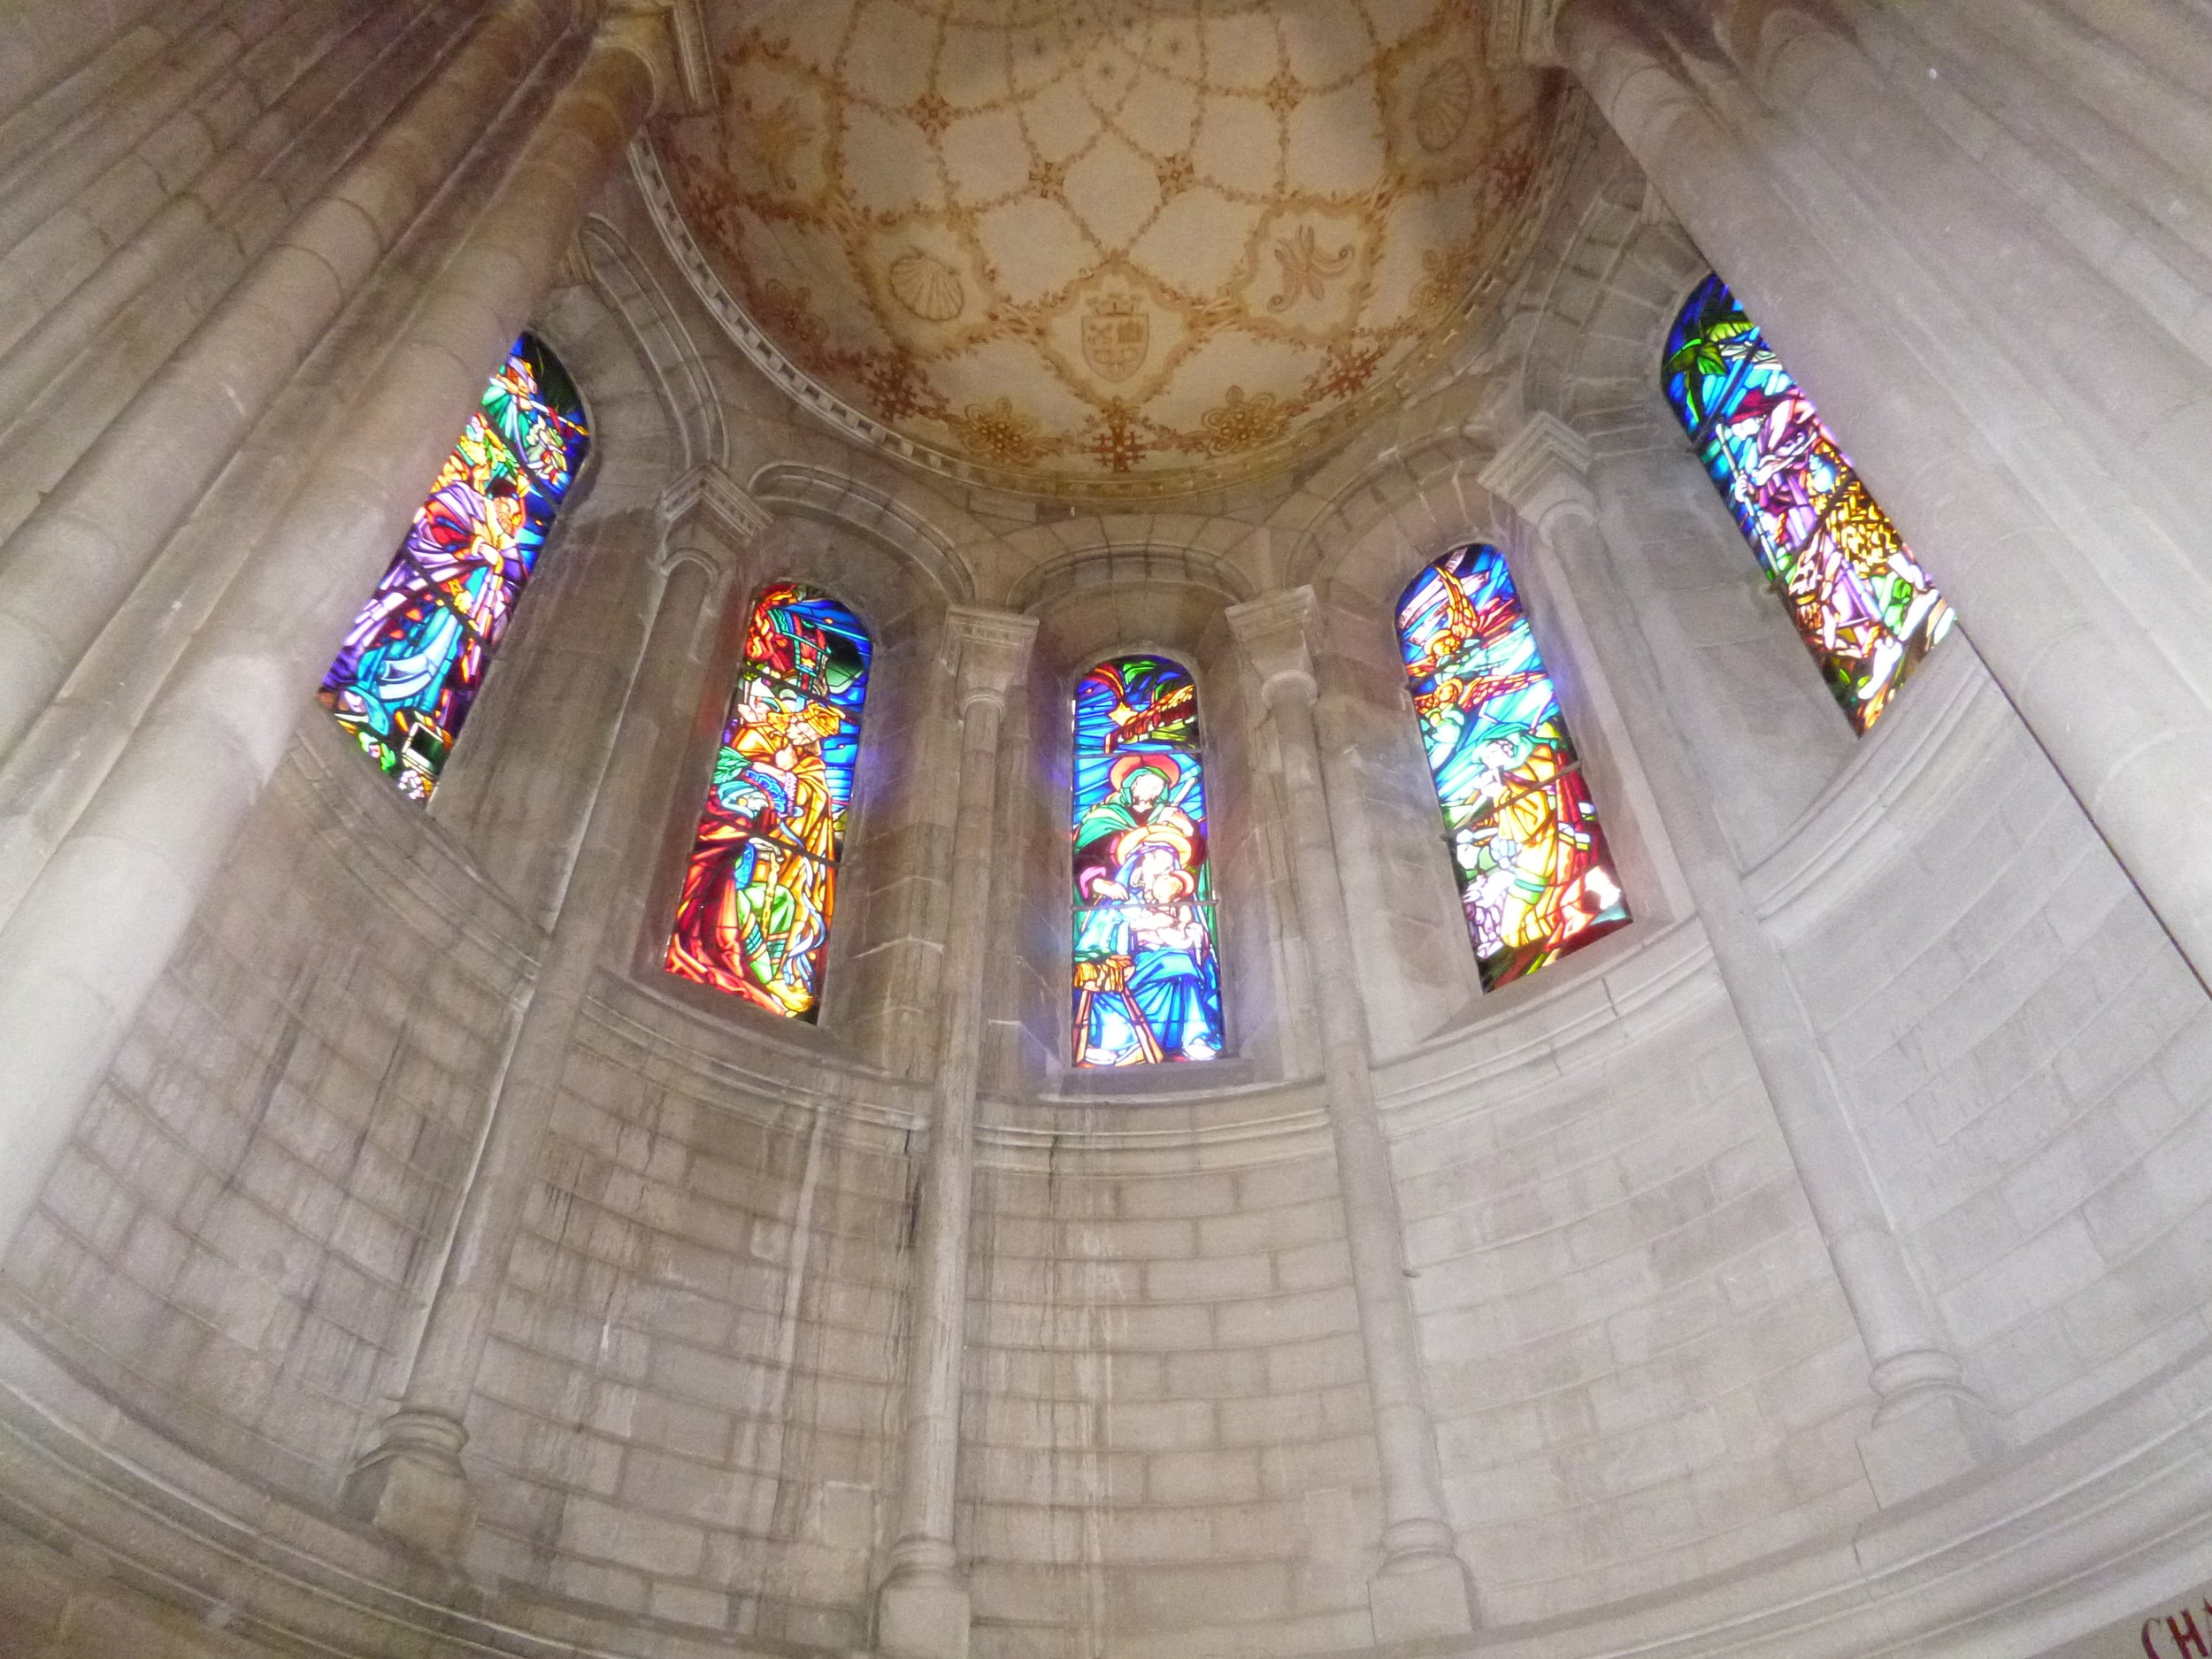 Stain glass windows, Basilica Penne d'Agenais.